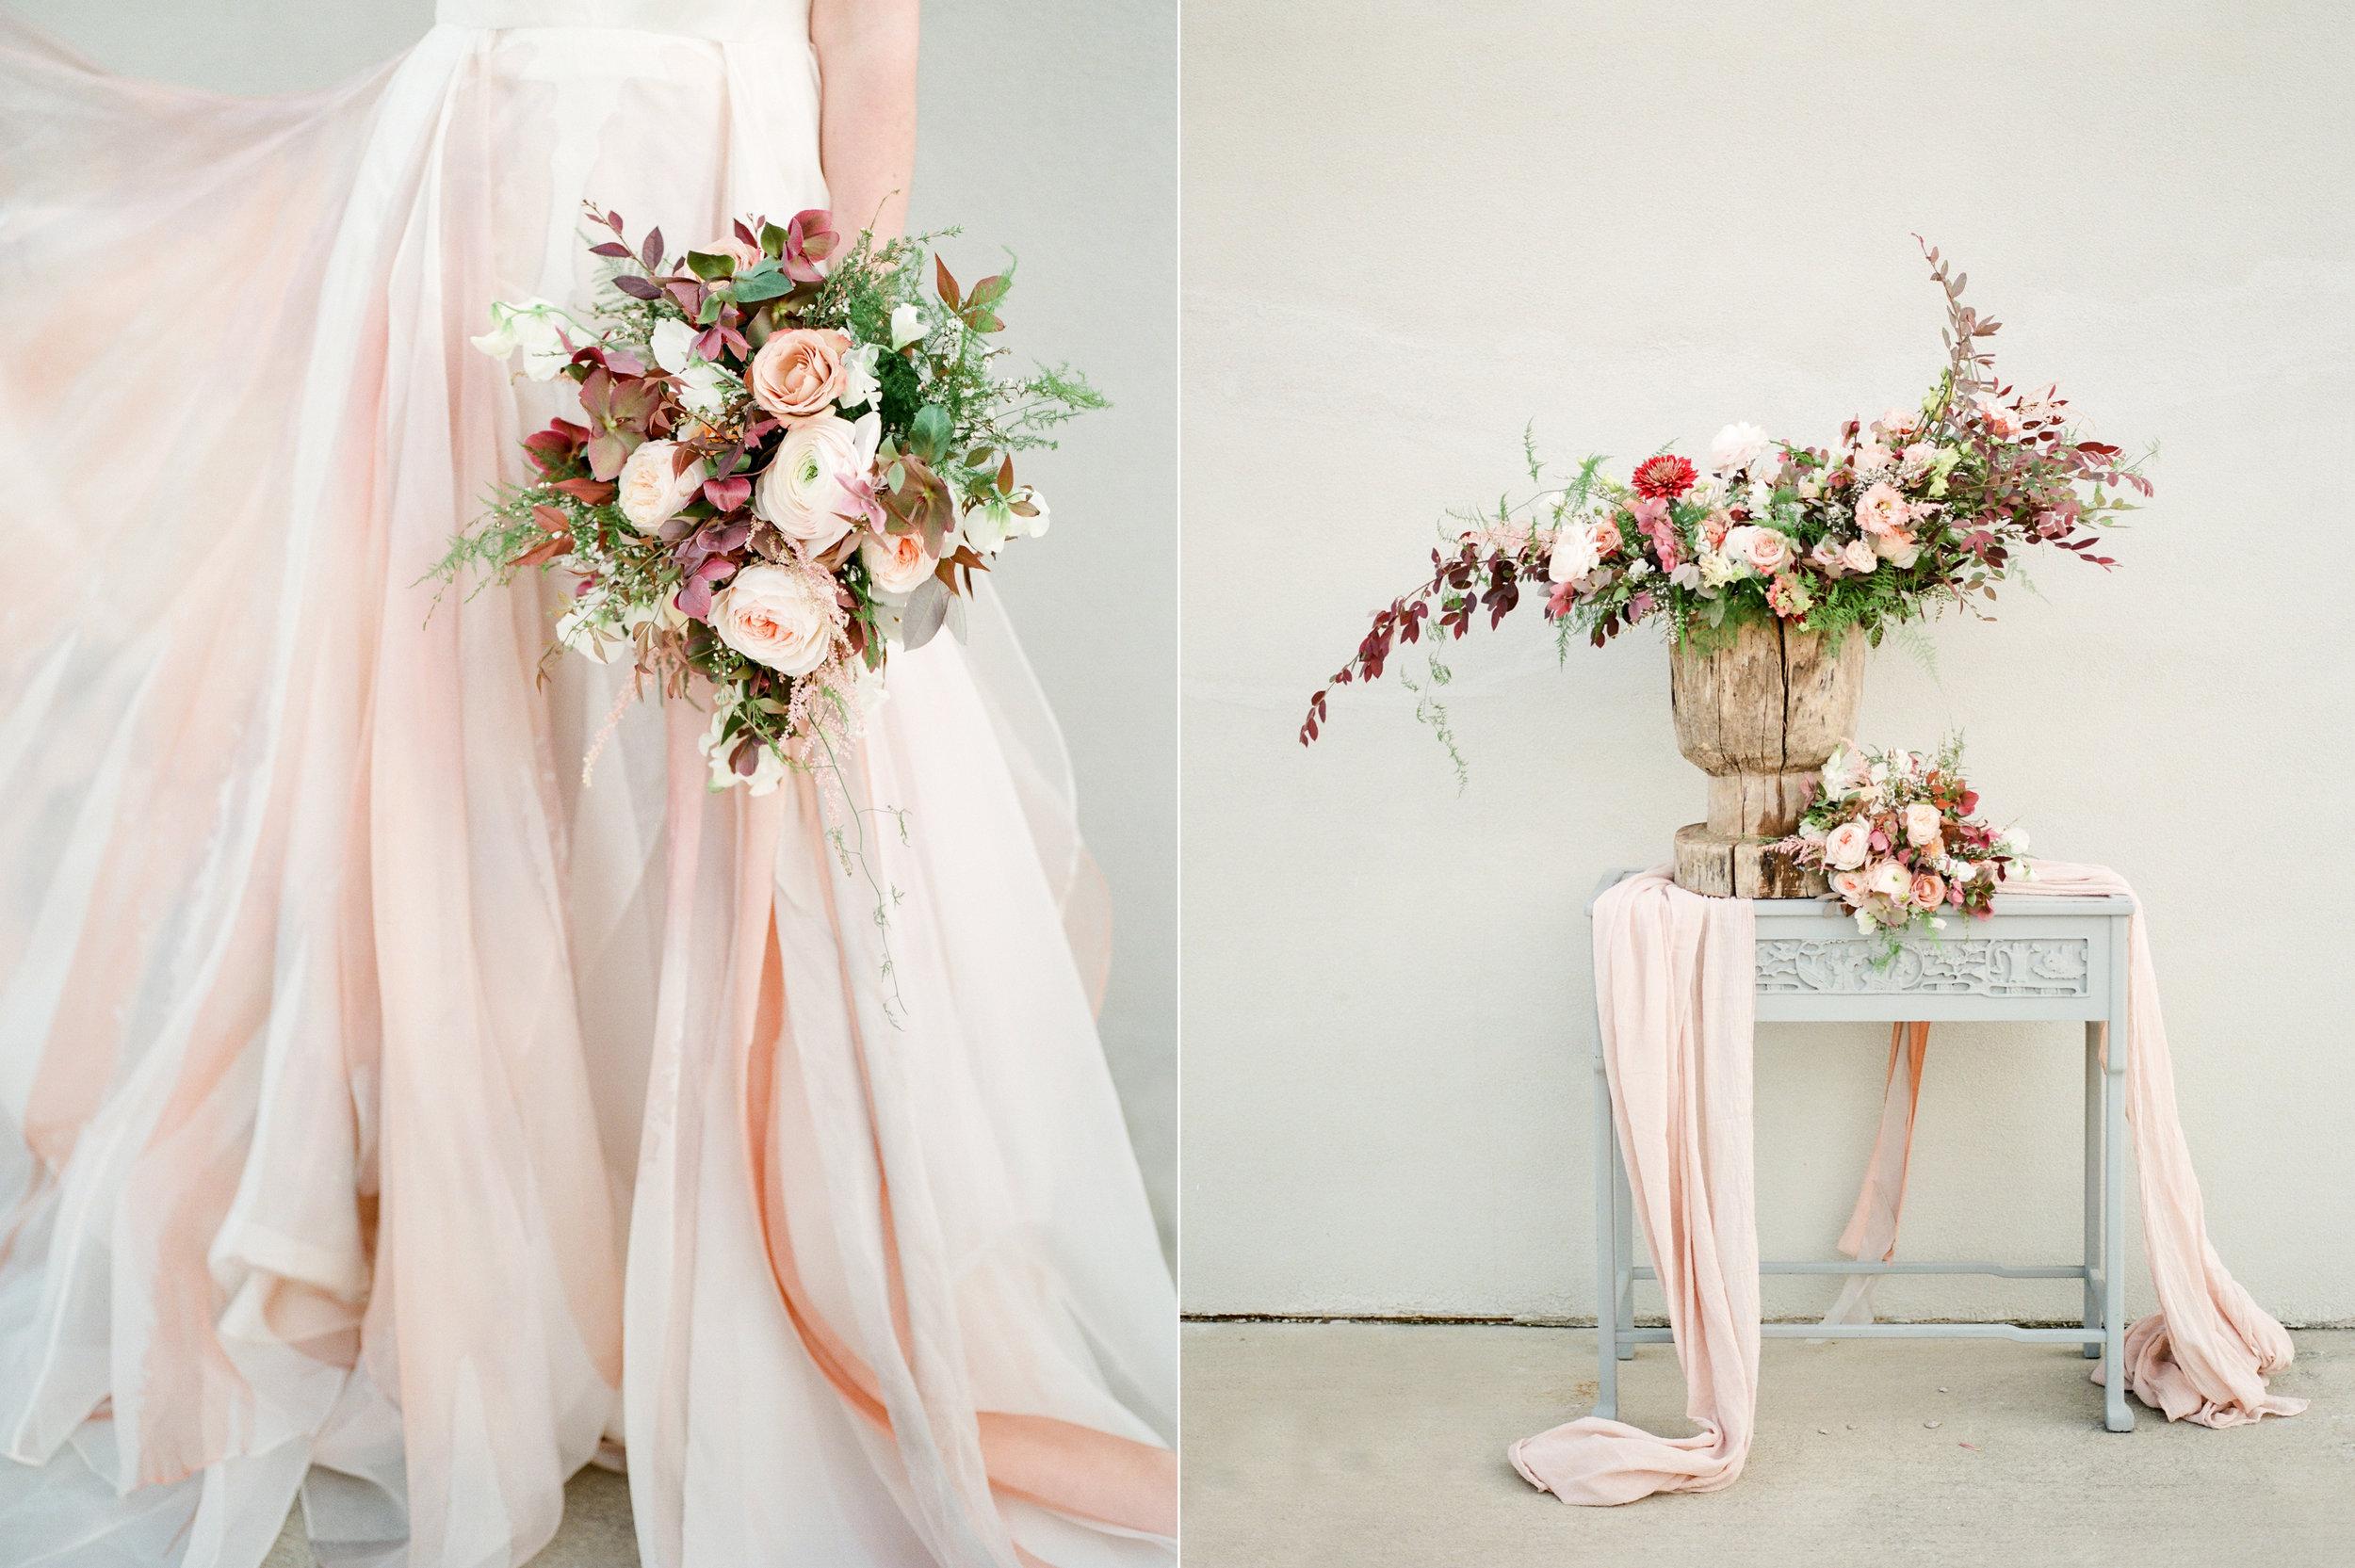 A lovely houston bride_wedding_Christine Gosch_www.christinegosch.com_Houston, TX-11.jpg